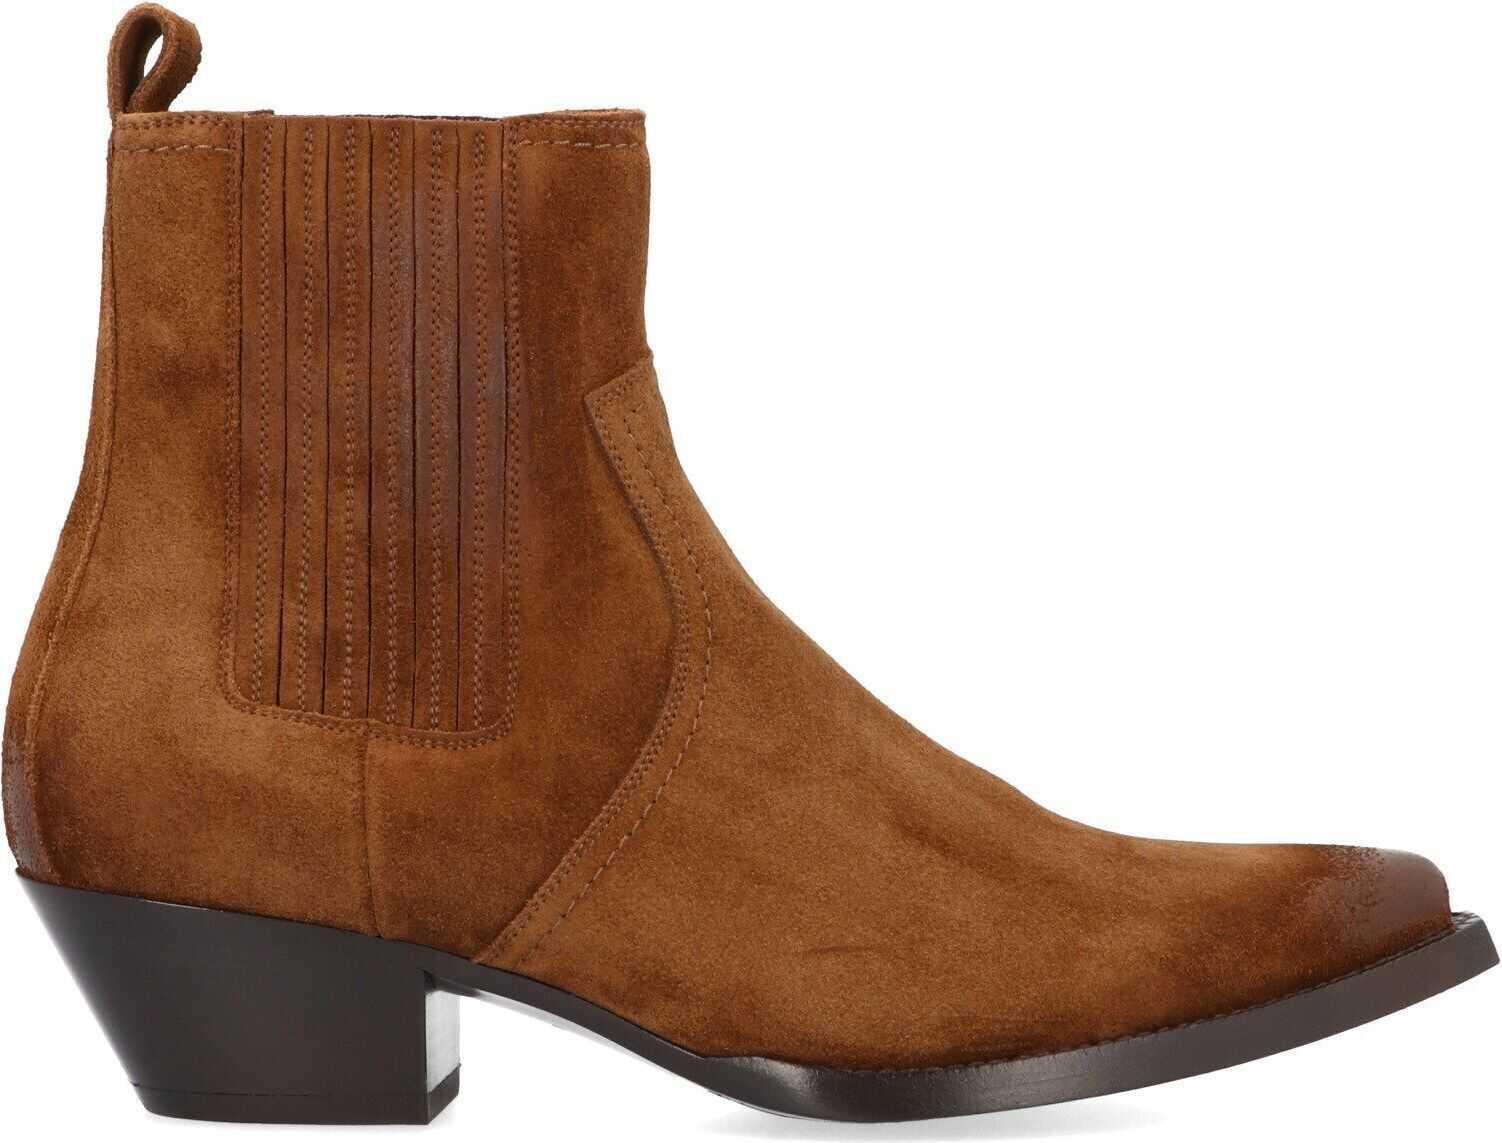 Saint Laurent Suede Ankle Boots BROWN